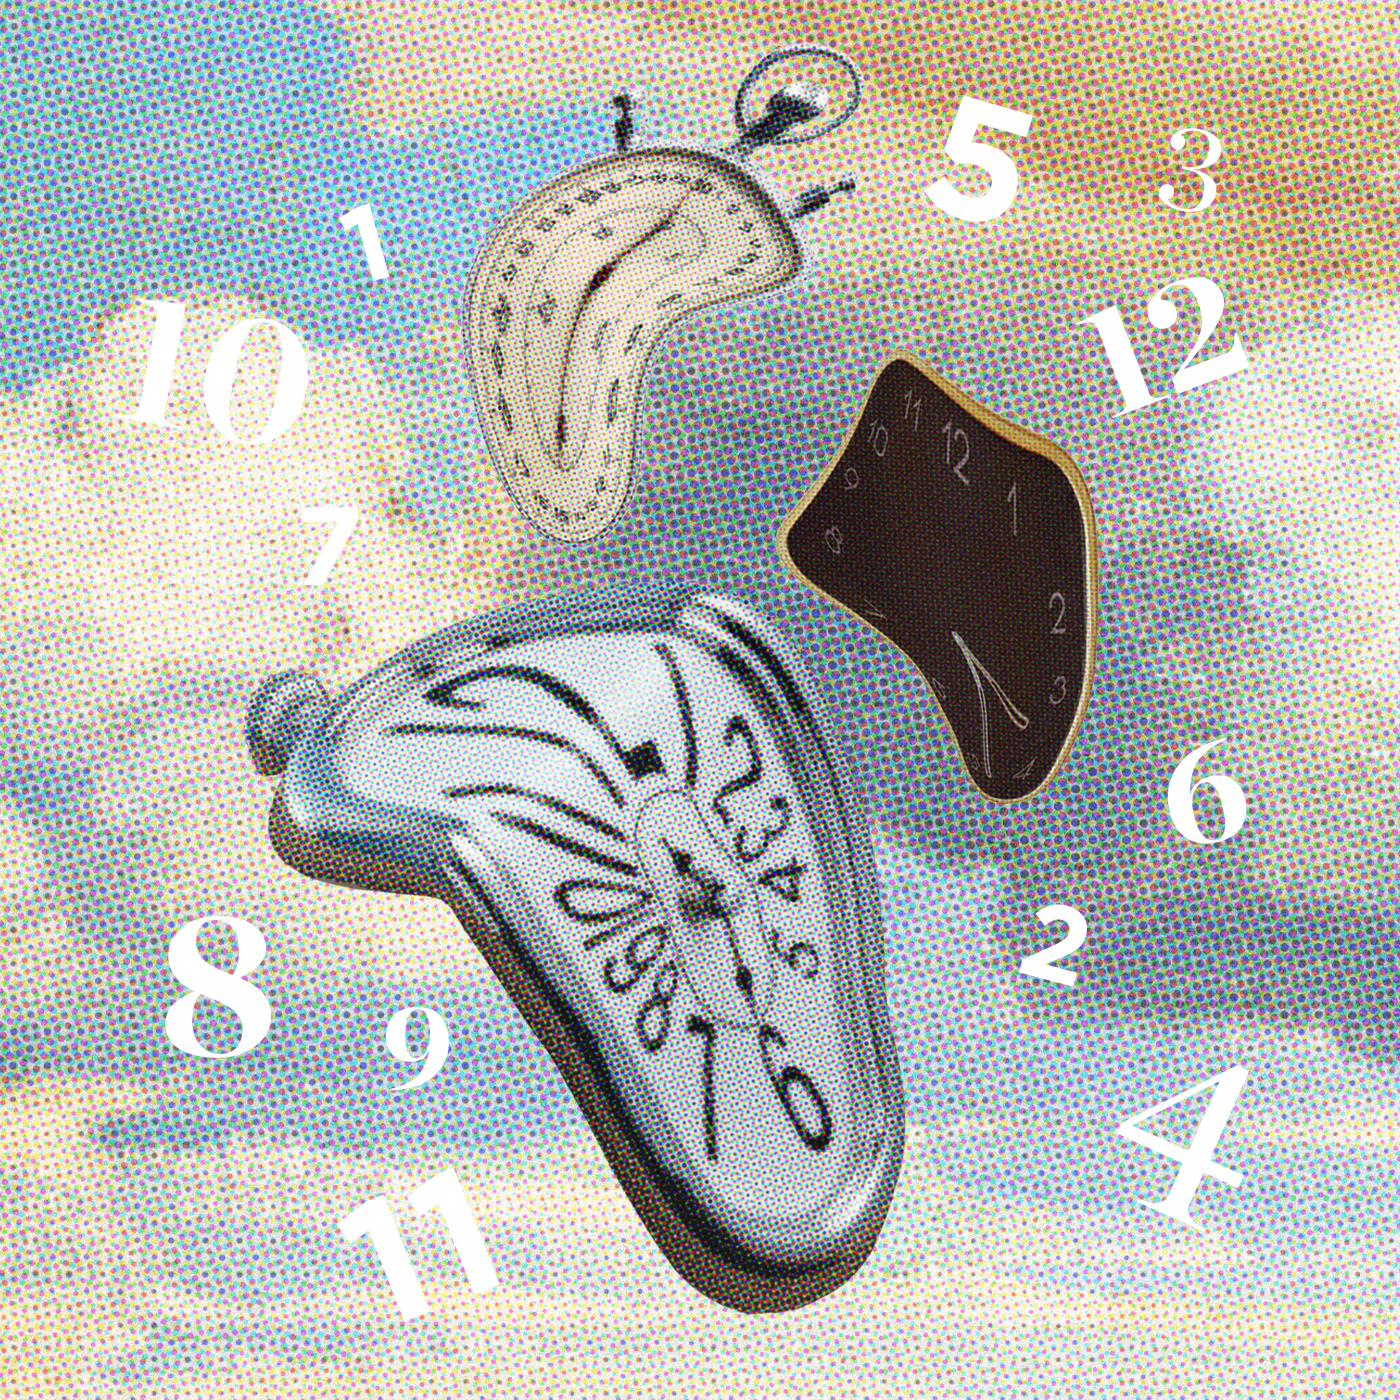 time-realism-man-repeller-oct-2018-aq.jpg